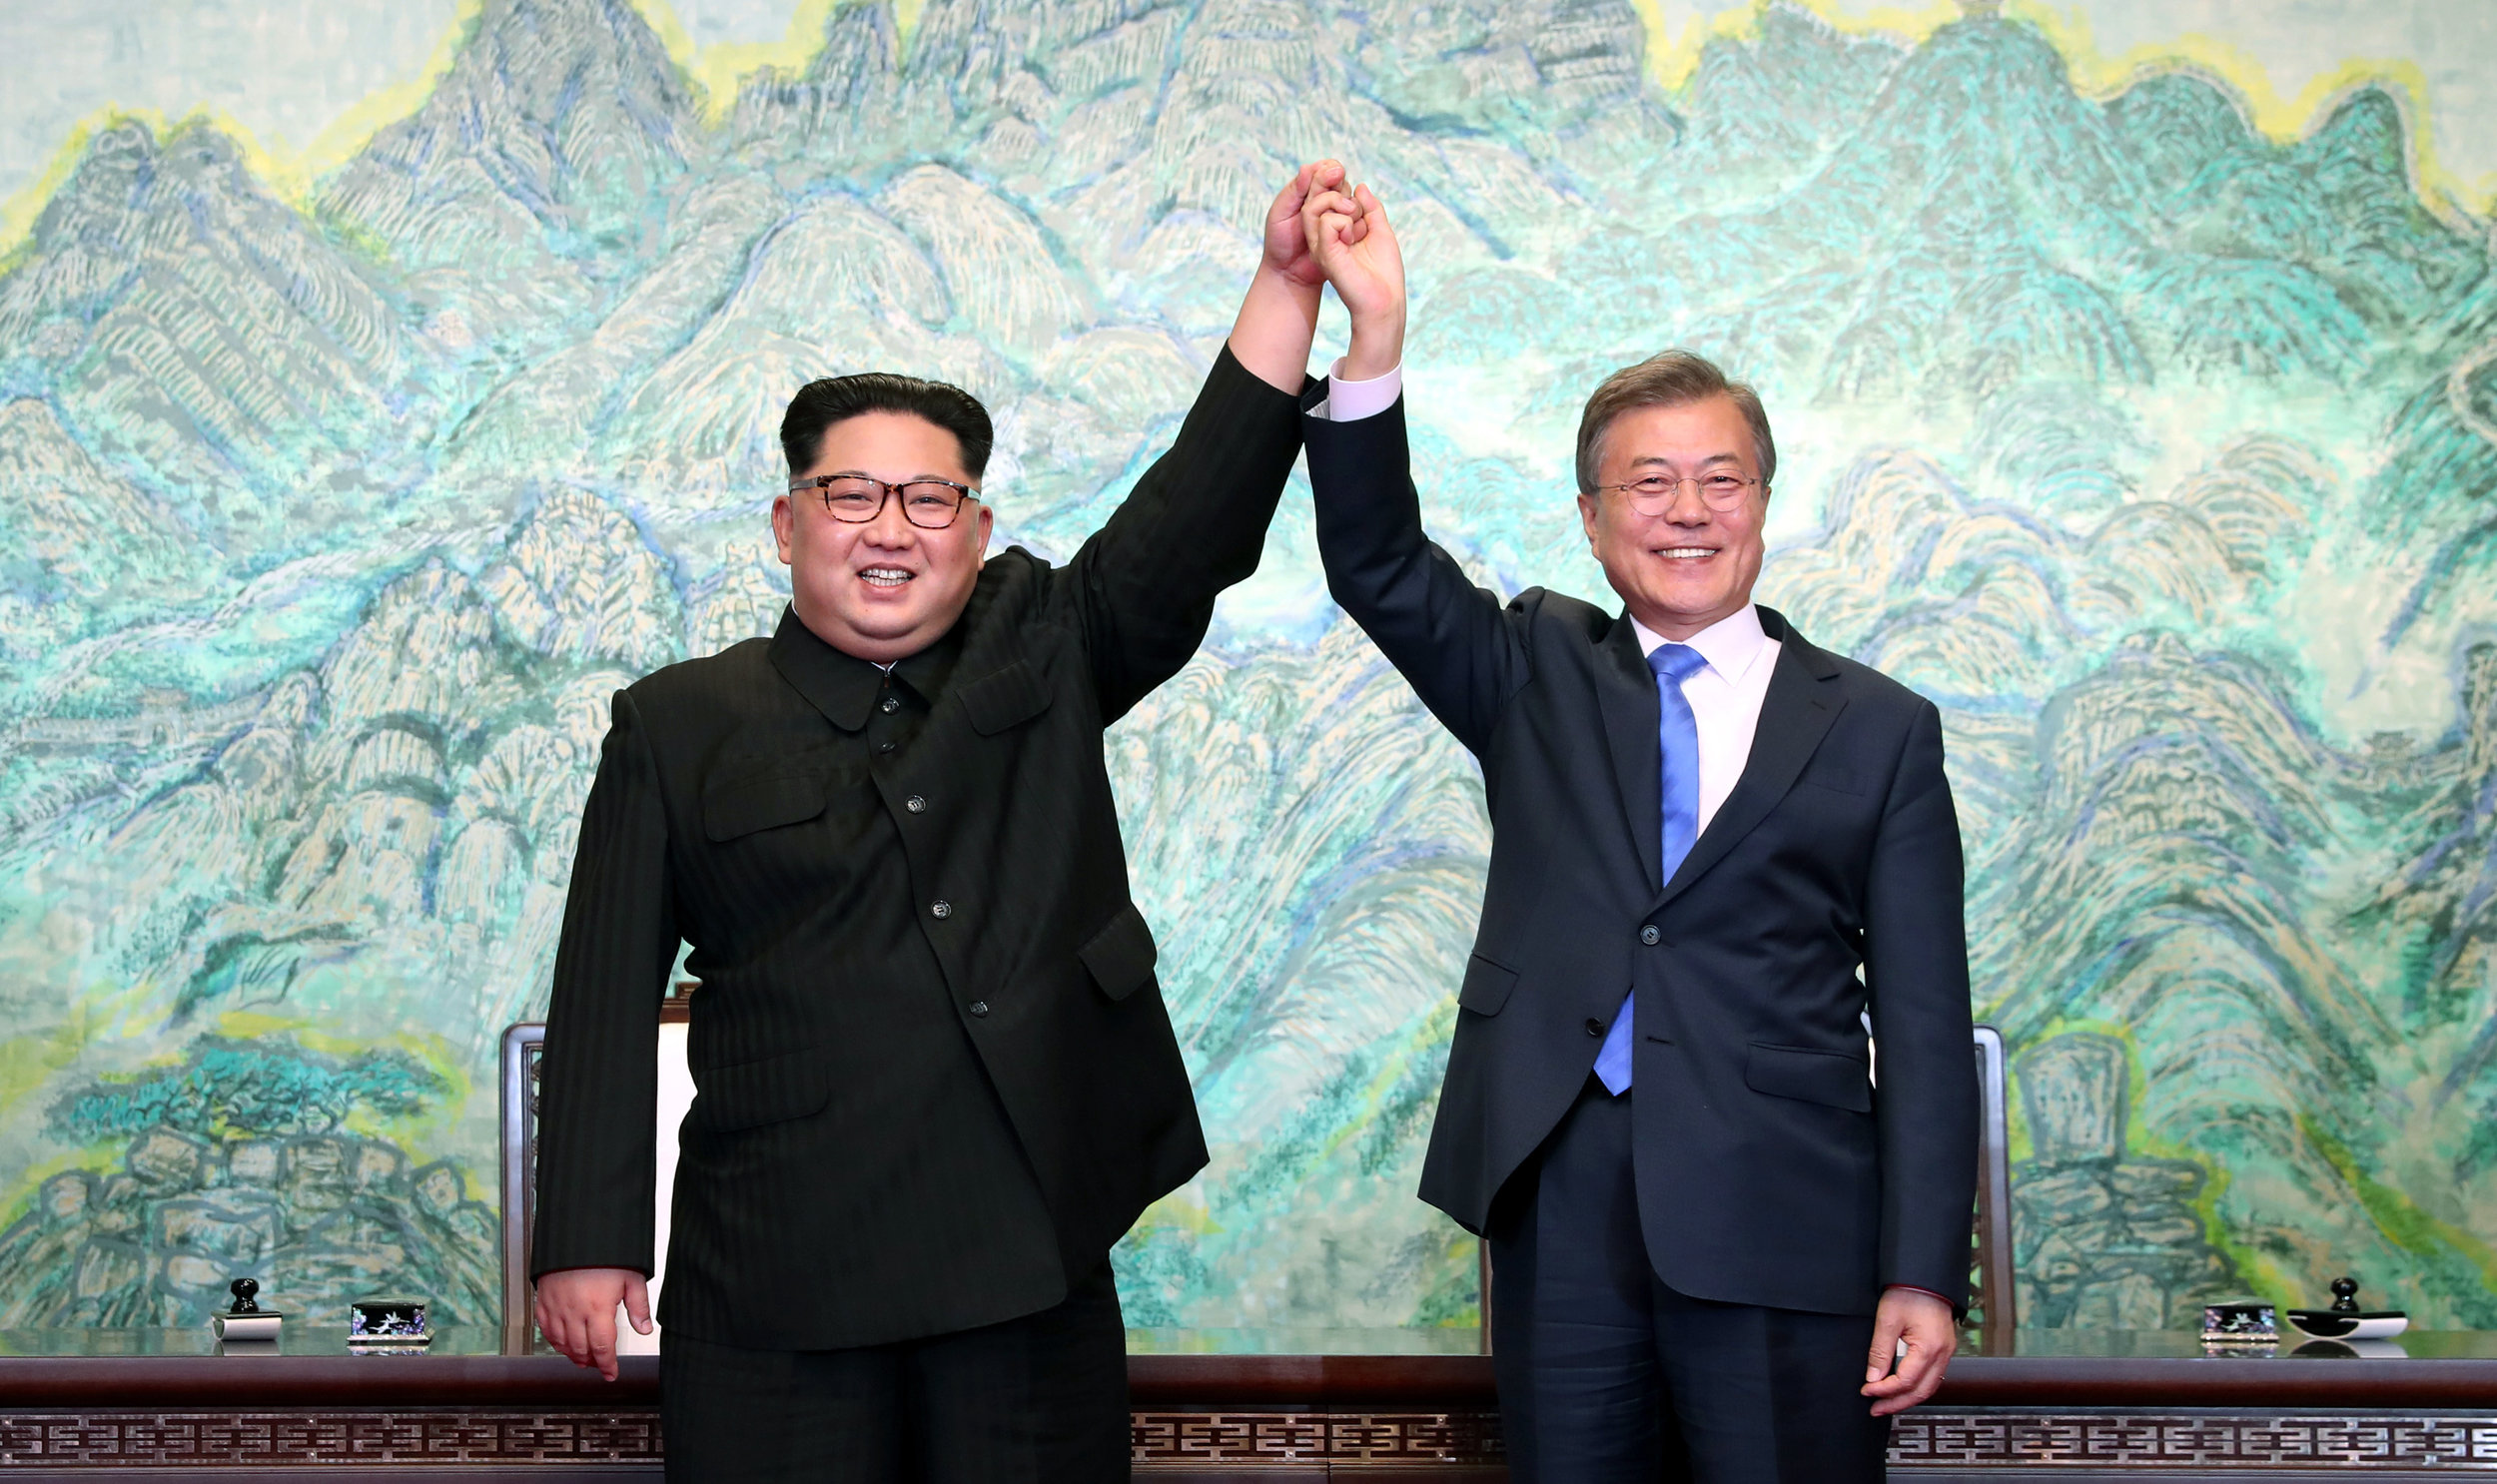 BILD: The Republic of Korea